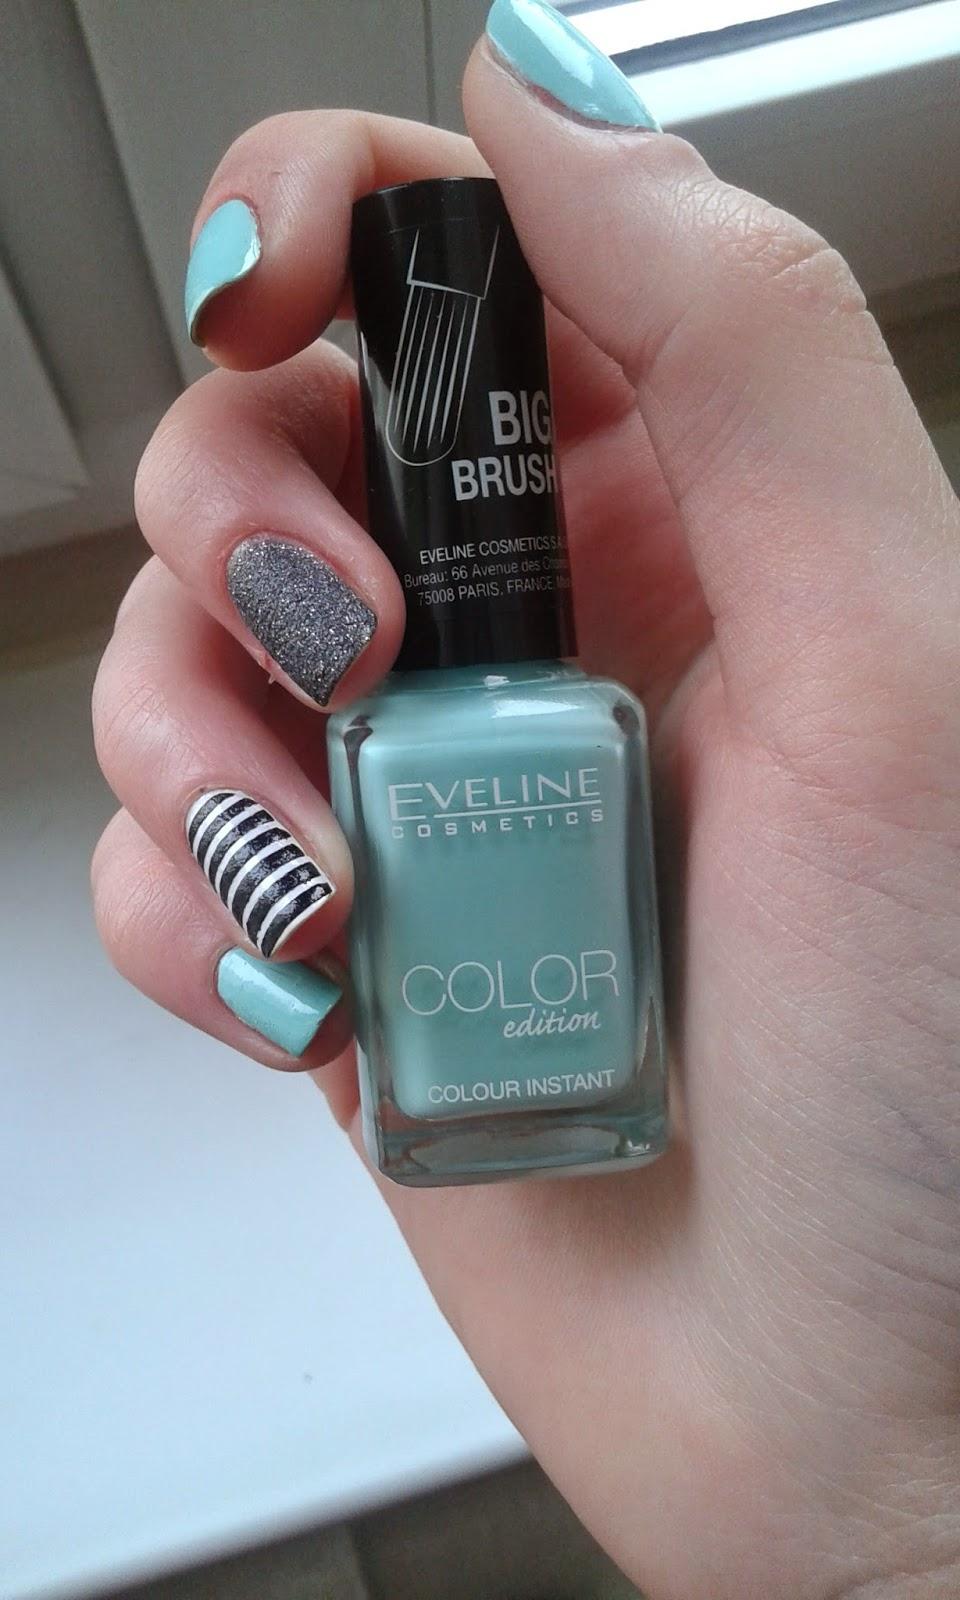 Eveline big brush colour instant 915